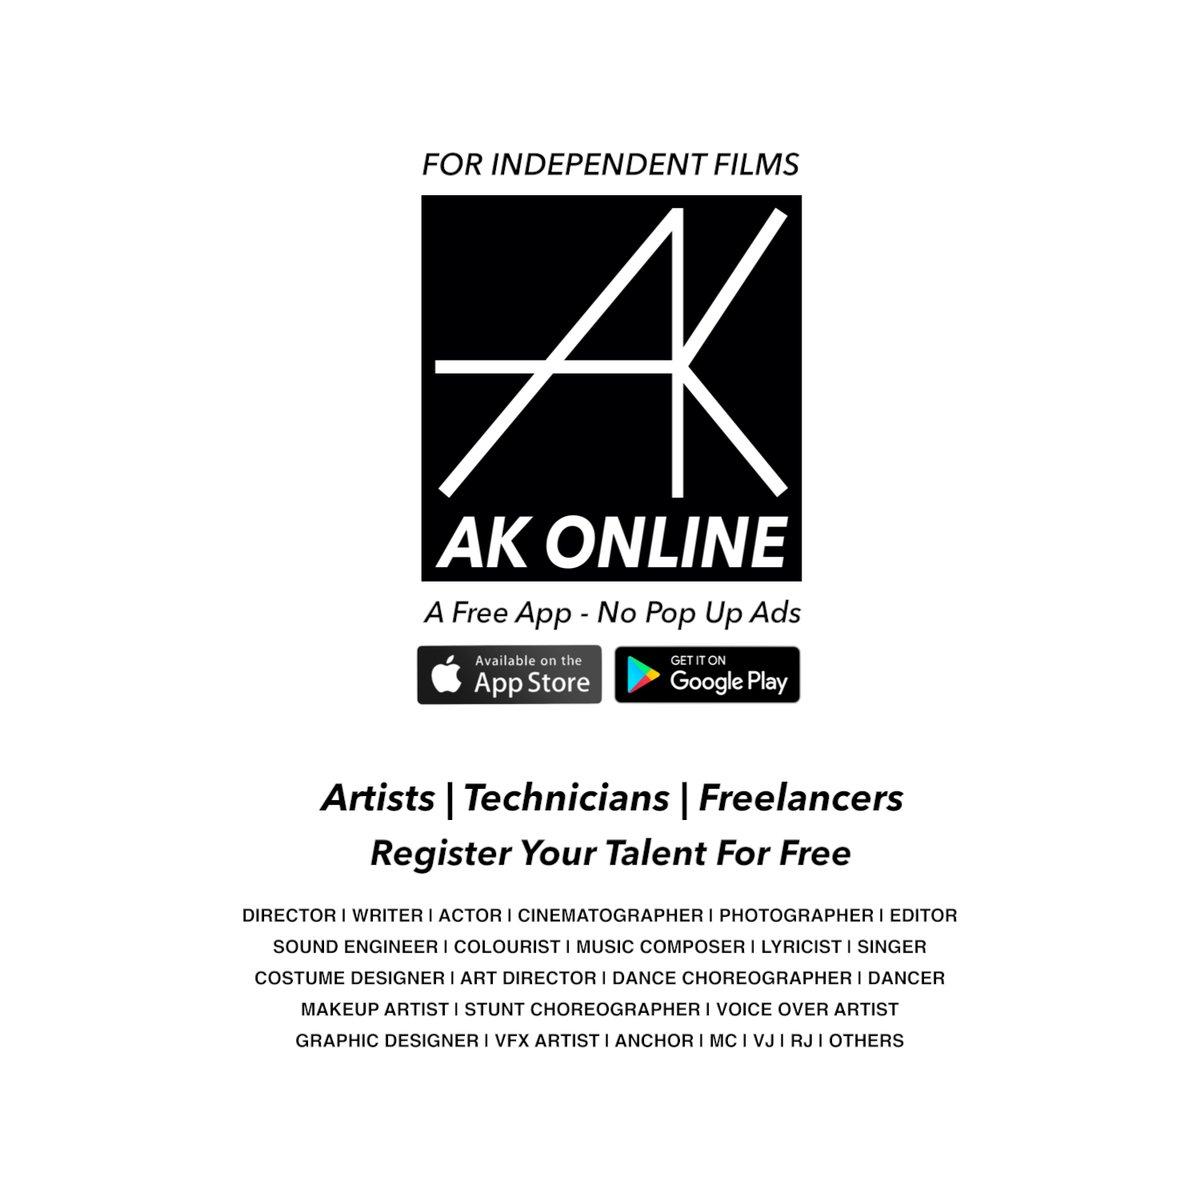 #director | #writer | #actor | #cinematographer | #photographer | #editor | #soundengineer | #colourist | #musiccomposer | #lyricist | #singer | #costumedesigner | #artdirector & more  Register Your #Talent :-  #Android : https://bit.ly/AKonlinePlay  #ios : https://bit.ly/AKonlineIOSpic.twitter.com/cUQnTBifBu